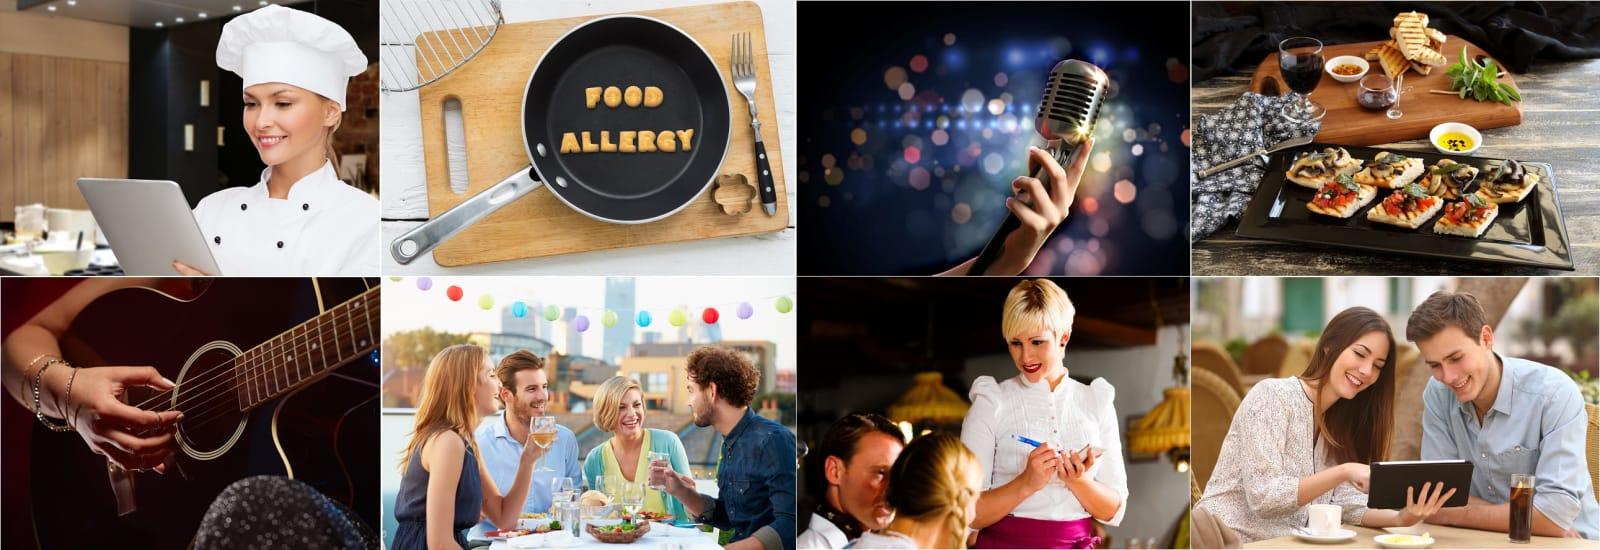 Restaurants, Bars, Hotels - Promote your venue, menus, events, news, facilities & more with KooZooK.com